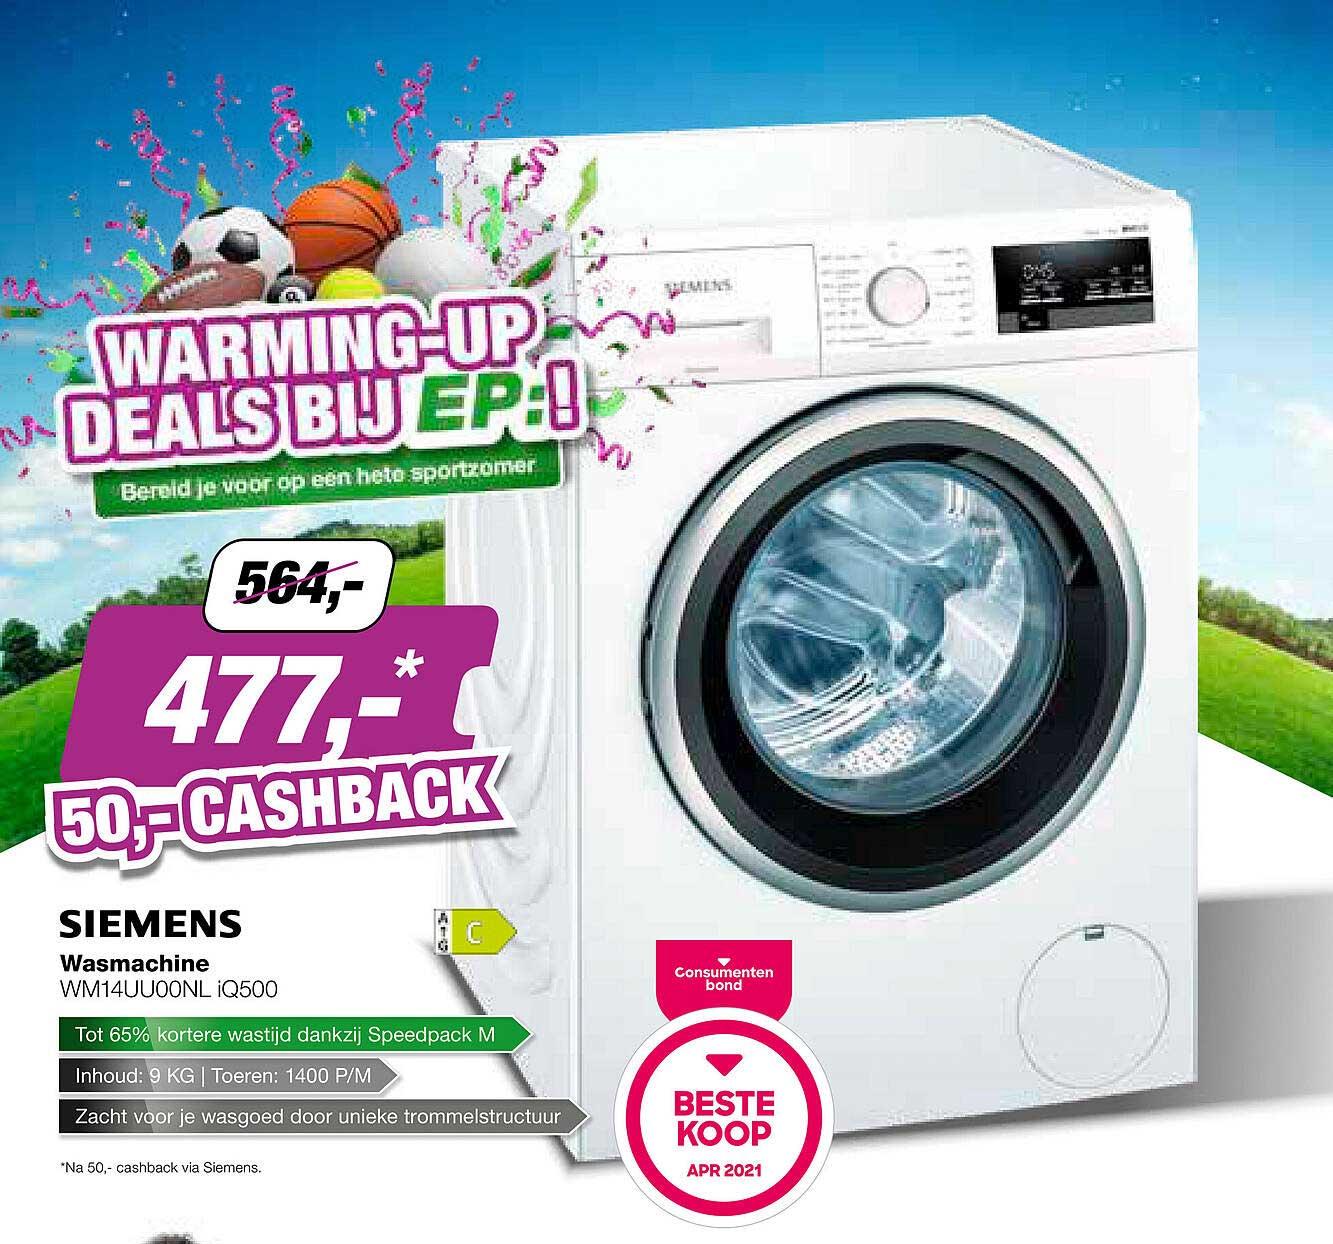 EP Siemens Wasmachine WM14UU00NL IQ500